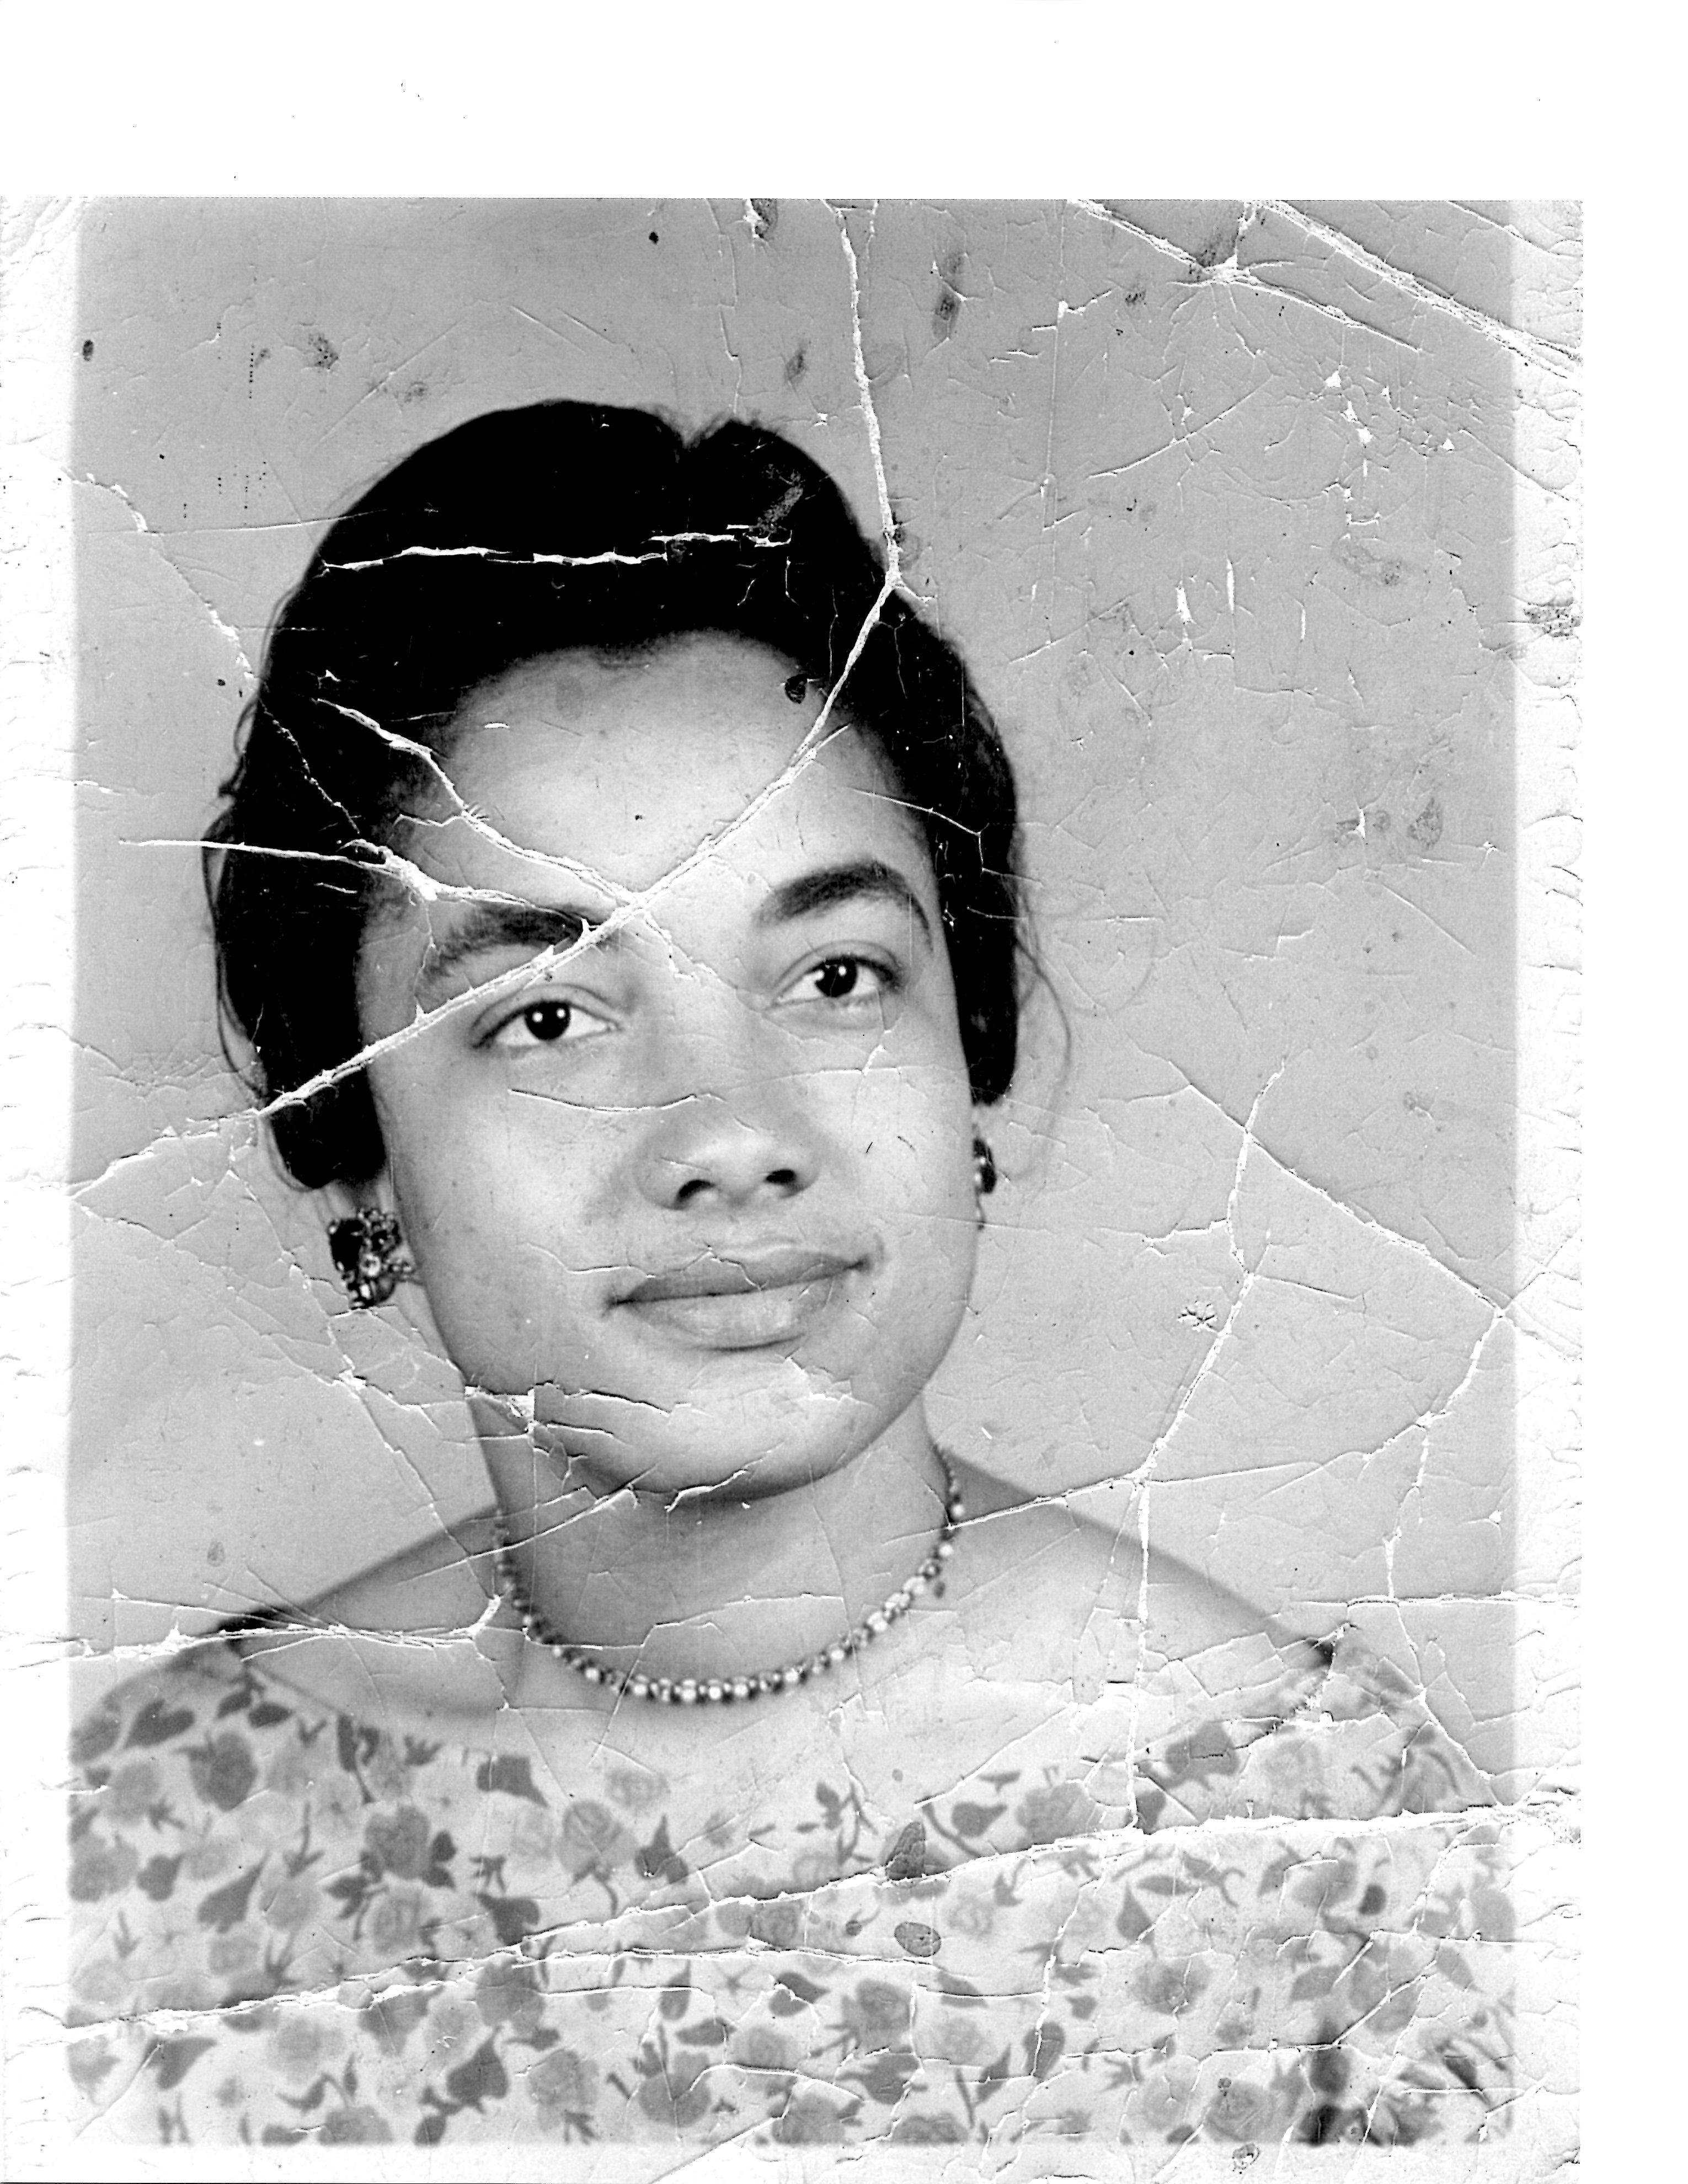 Alabama wilcox county camden - Rosetta Anderson Camden Civil Rights Leader